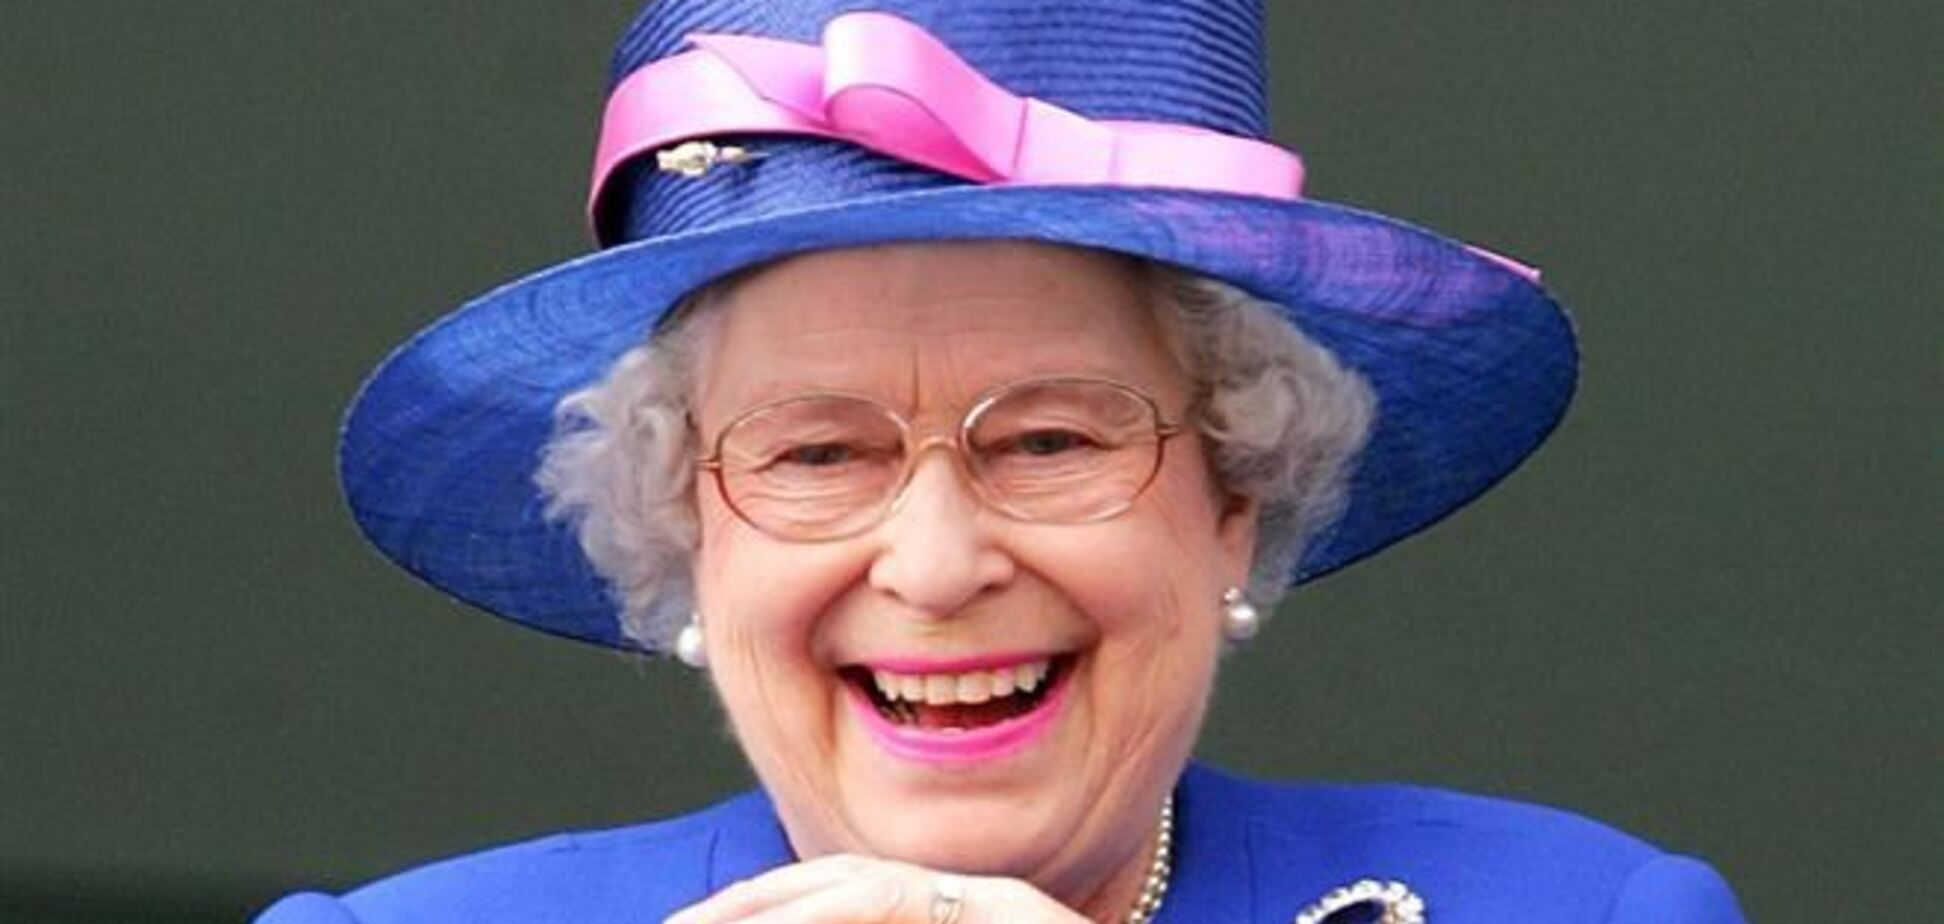 Єлизавета II поселить гостей в кімнатах для прислуги